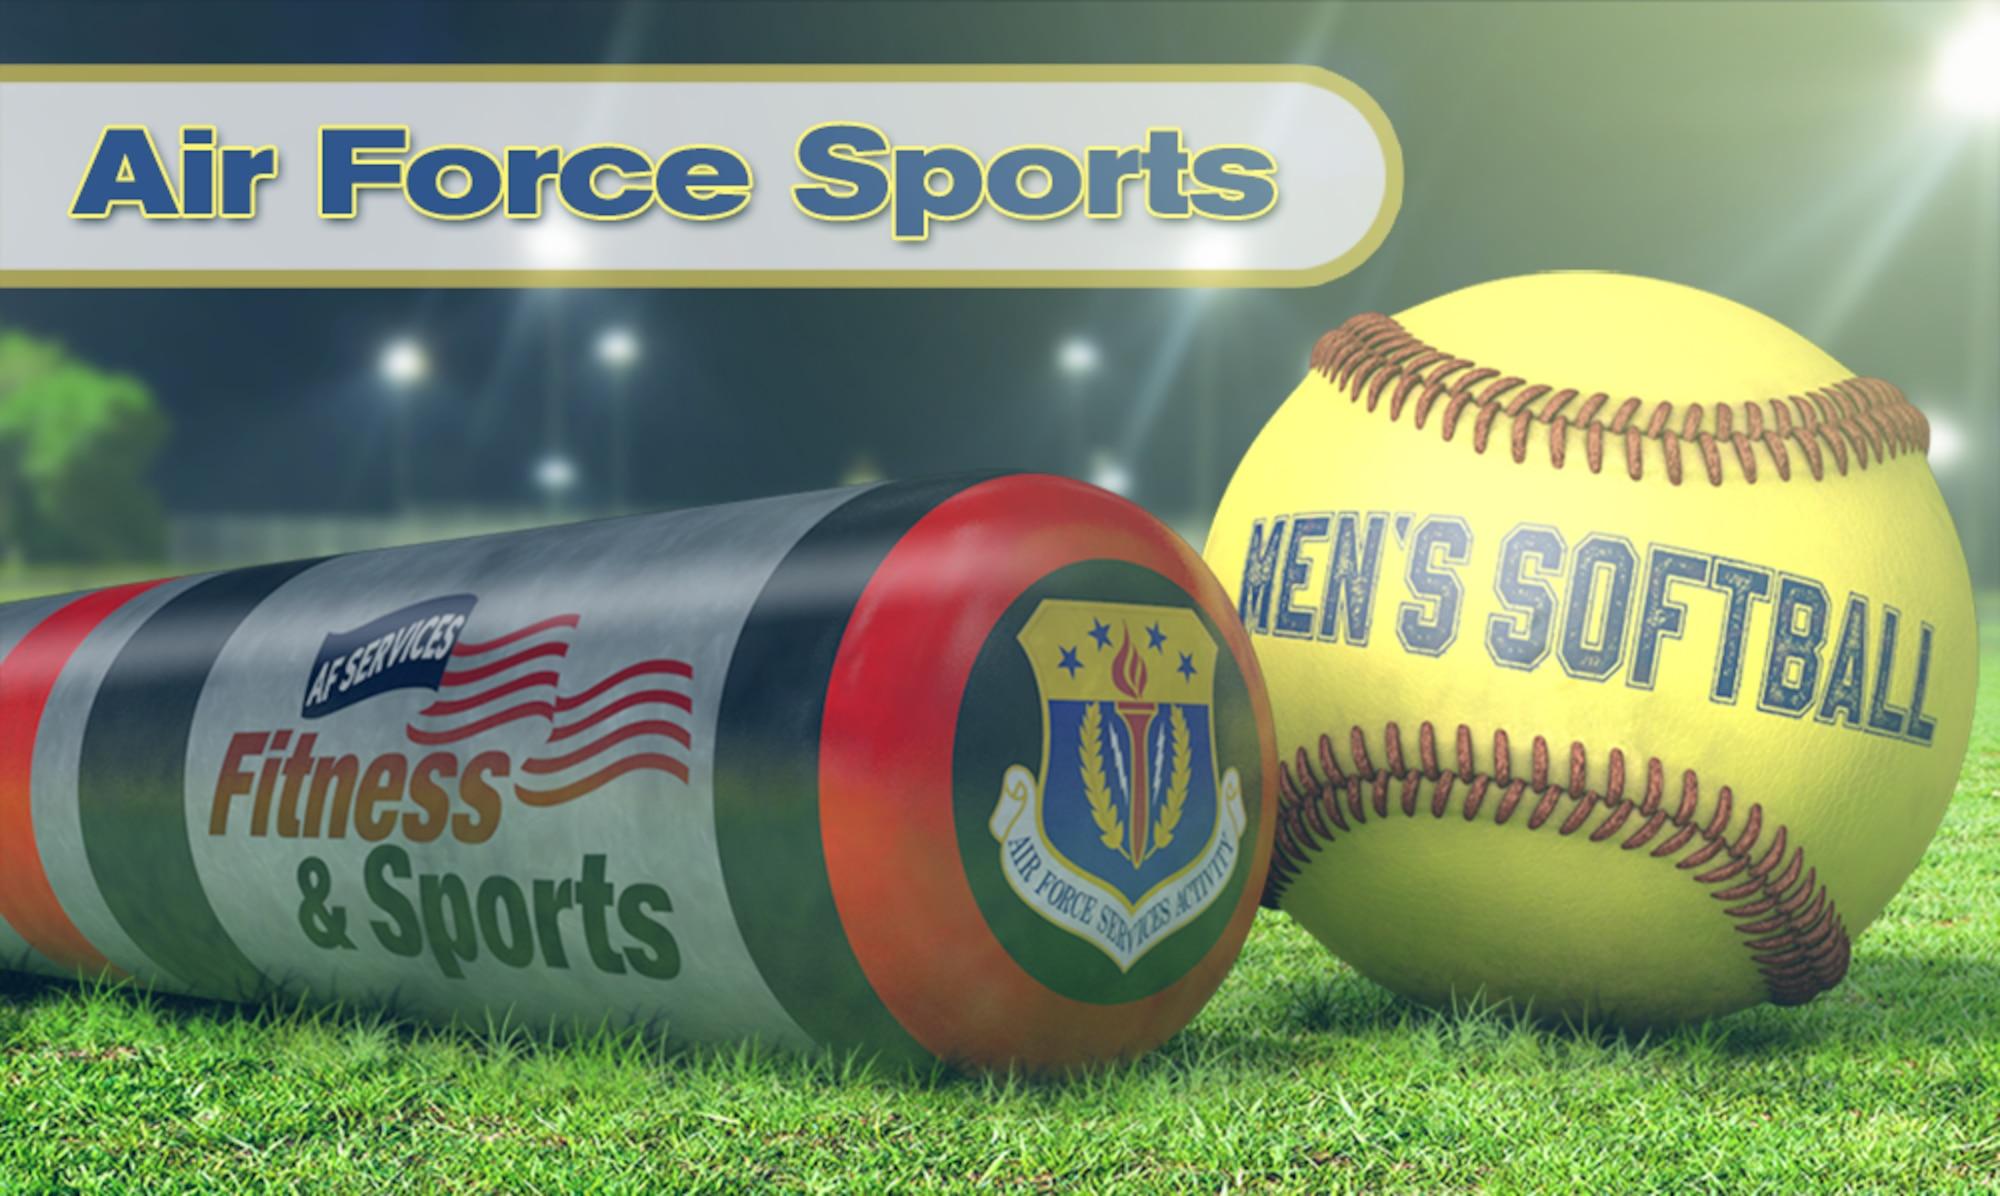 Air Force Men's Softball graphic